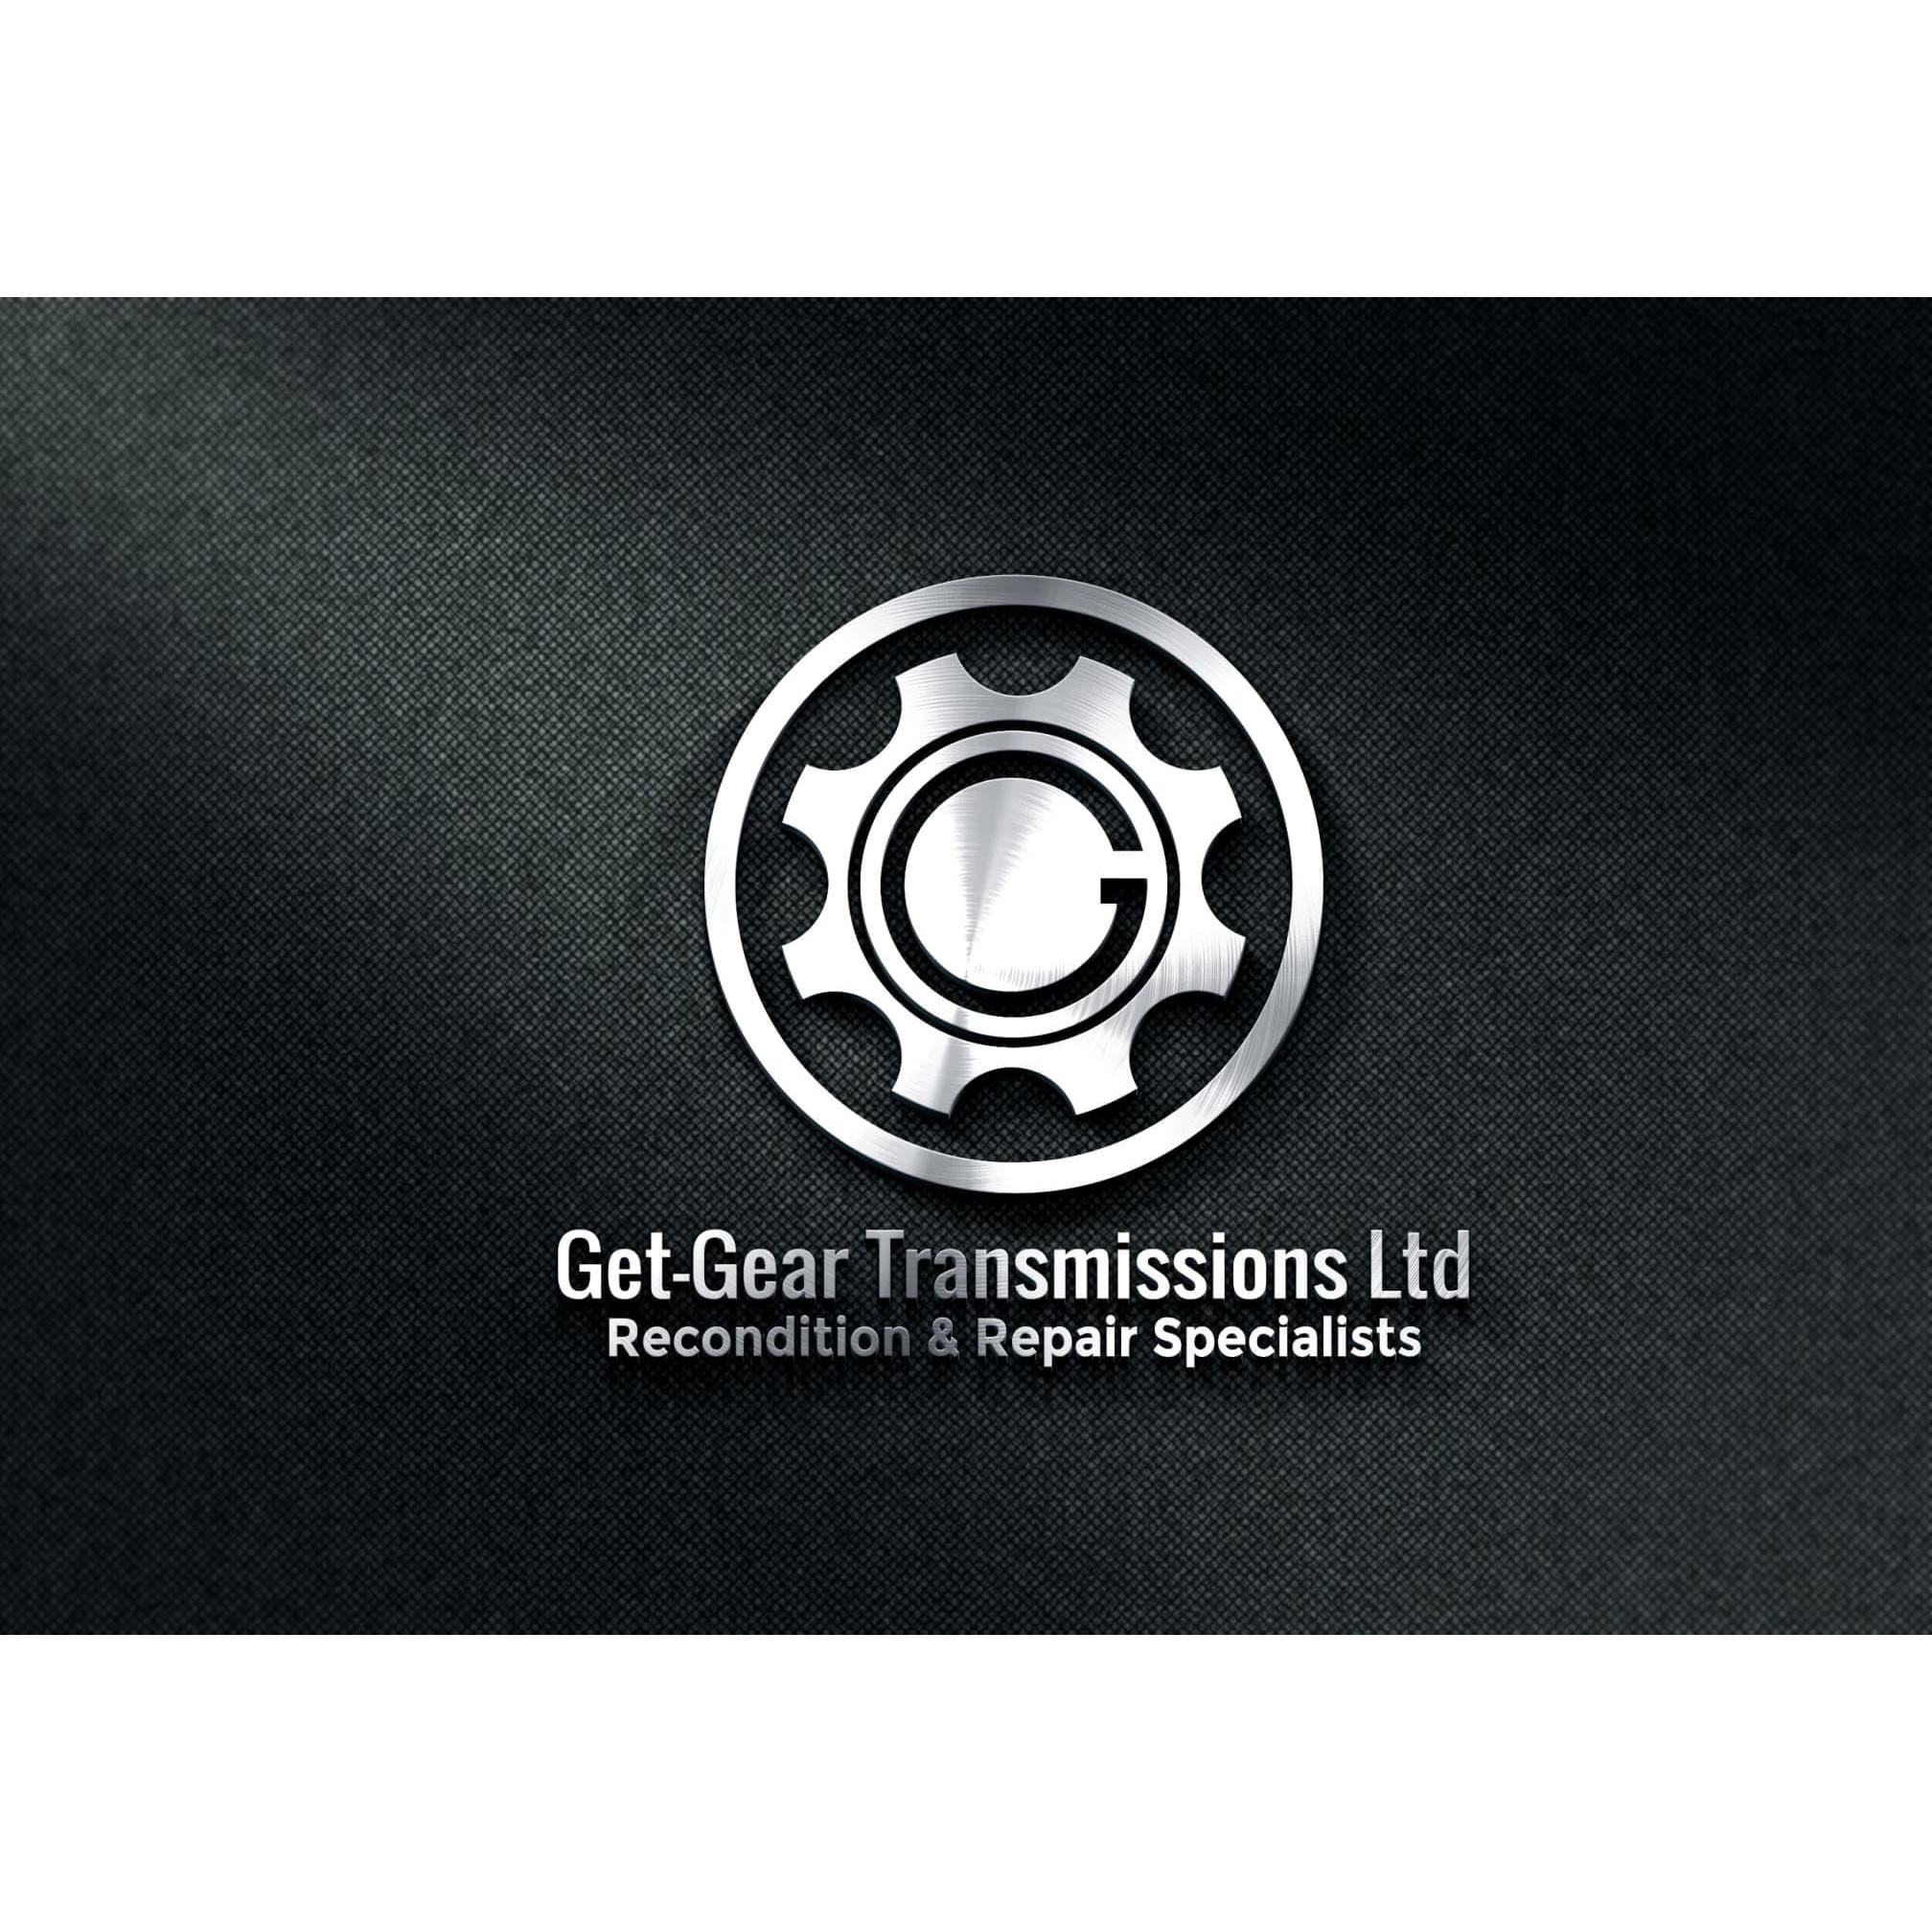 Get-Gear Transmissions Ltd - Willenhall, West Midlands WV13 1NE - 01902 608865 | ShowMeLocal.com